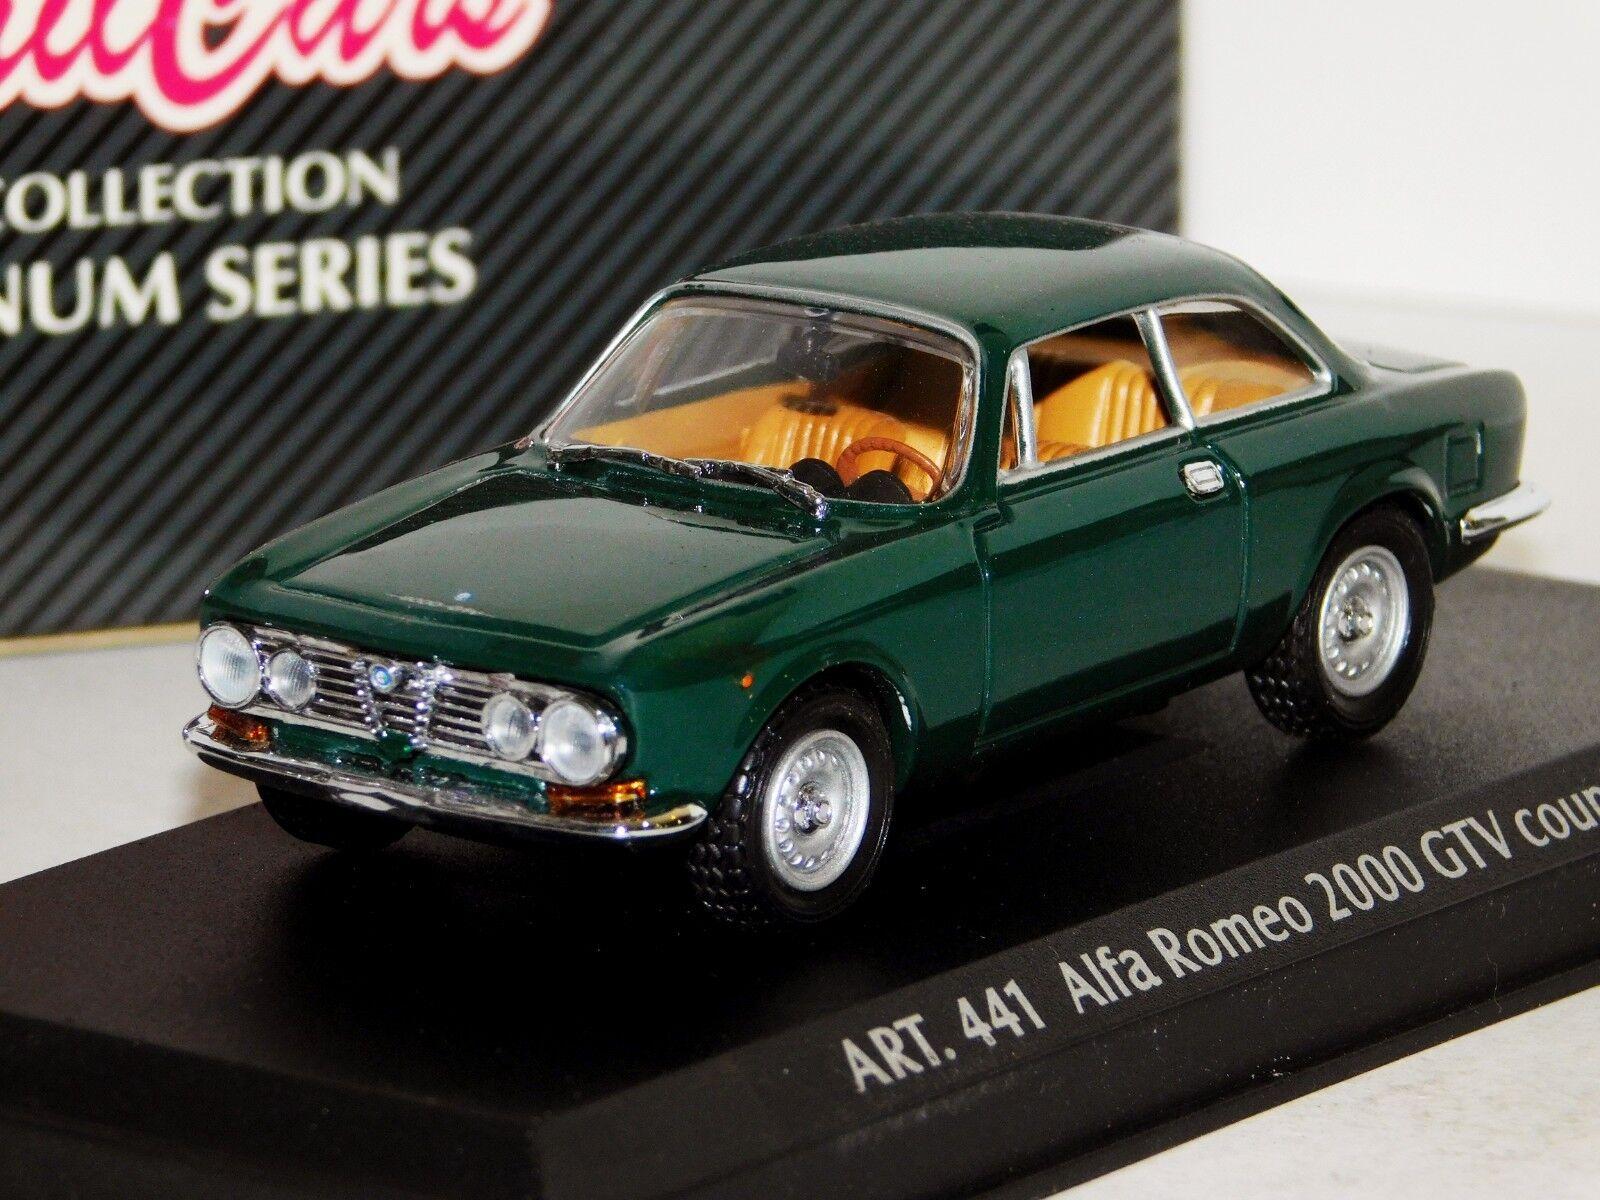 ALFA ROMEO GTV 2000 COUPE 1971 GREEN DETAIL CARS ART 441 1 43